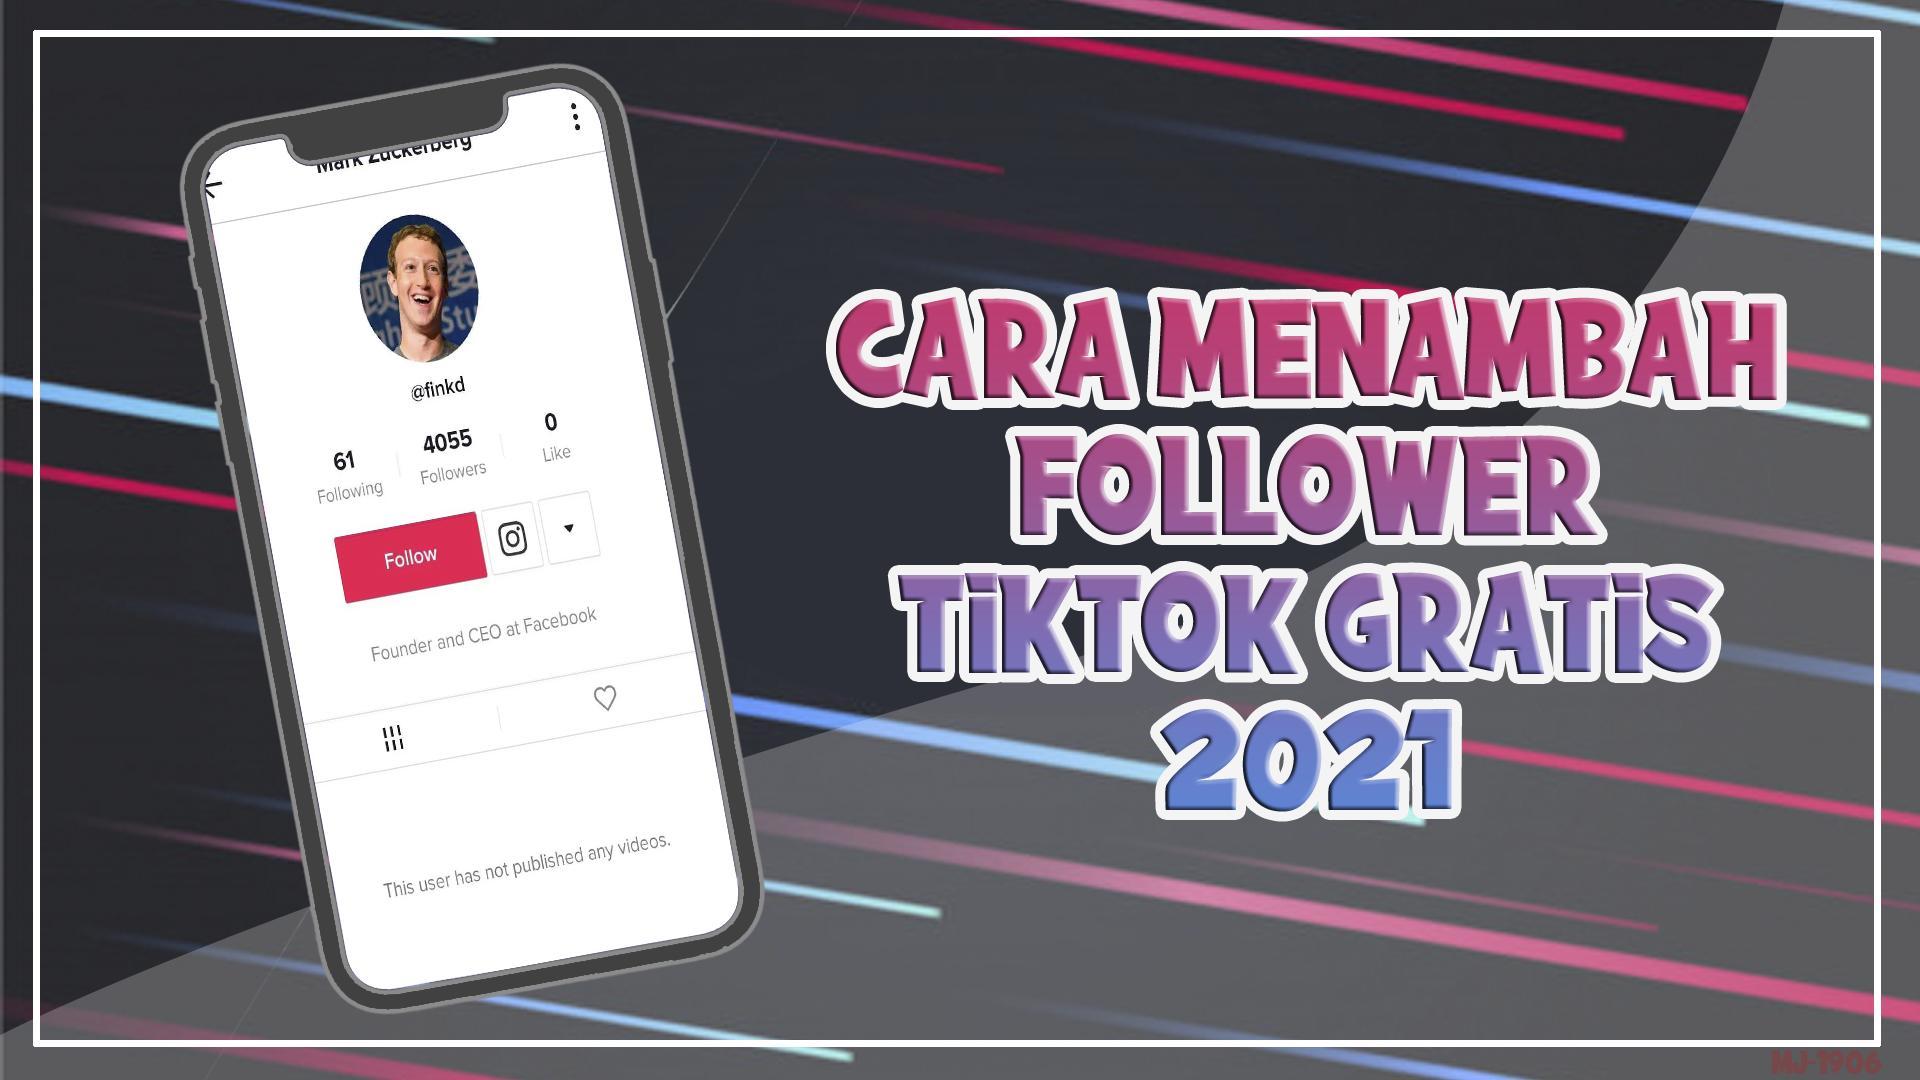 Cara Menambah Follower Tiktok Gratis 2021 For Android Apk Download